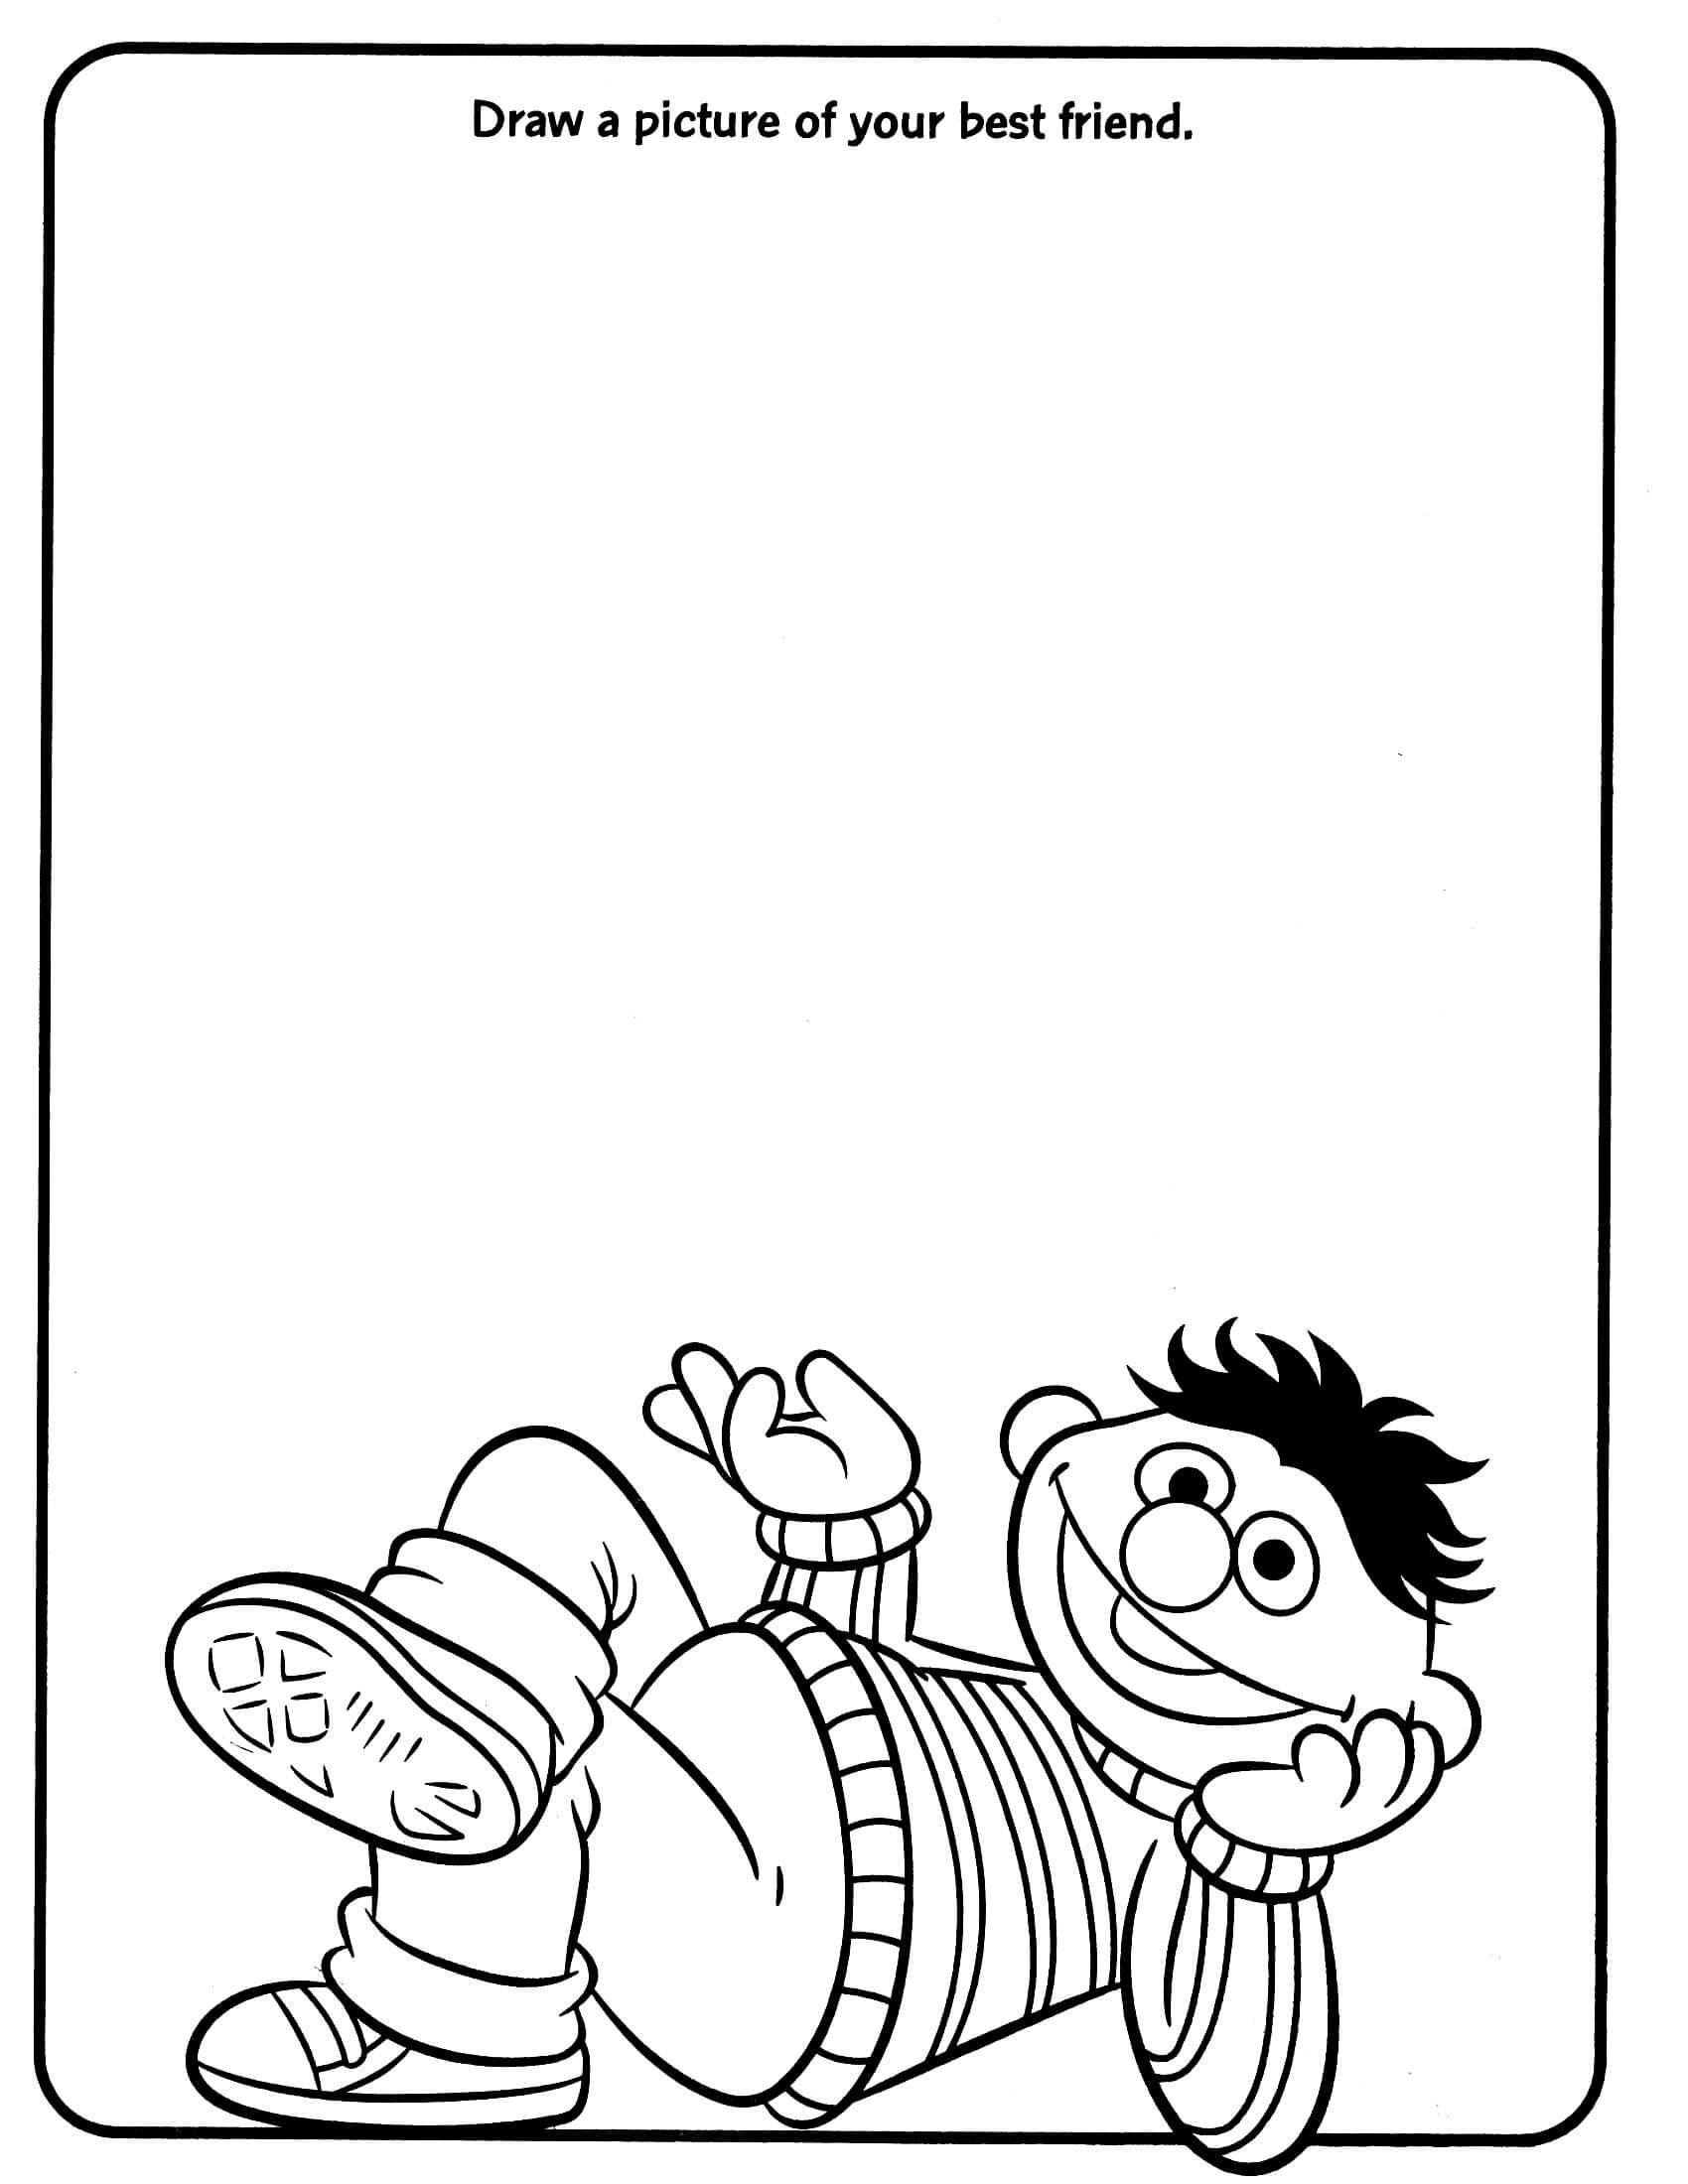 Sesame Street Drawing Worksheet